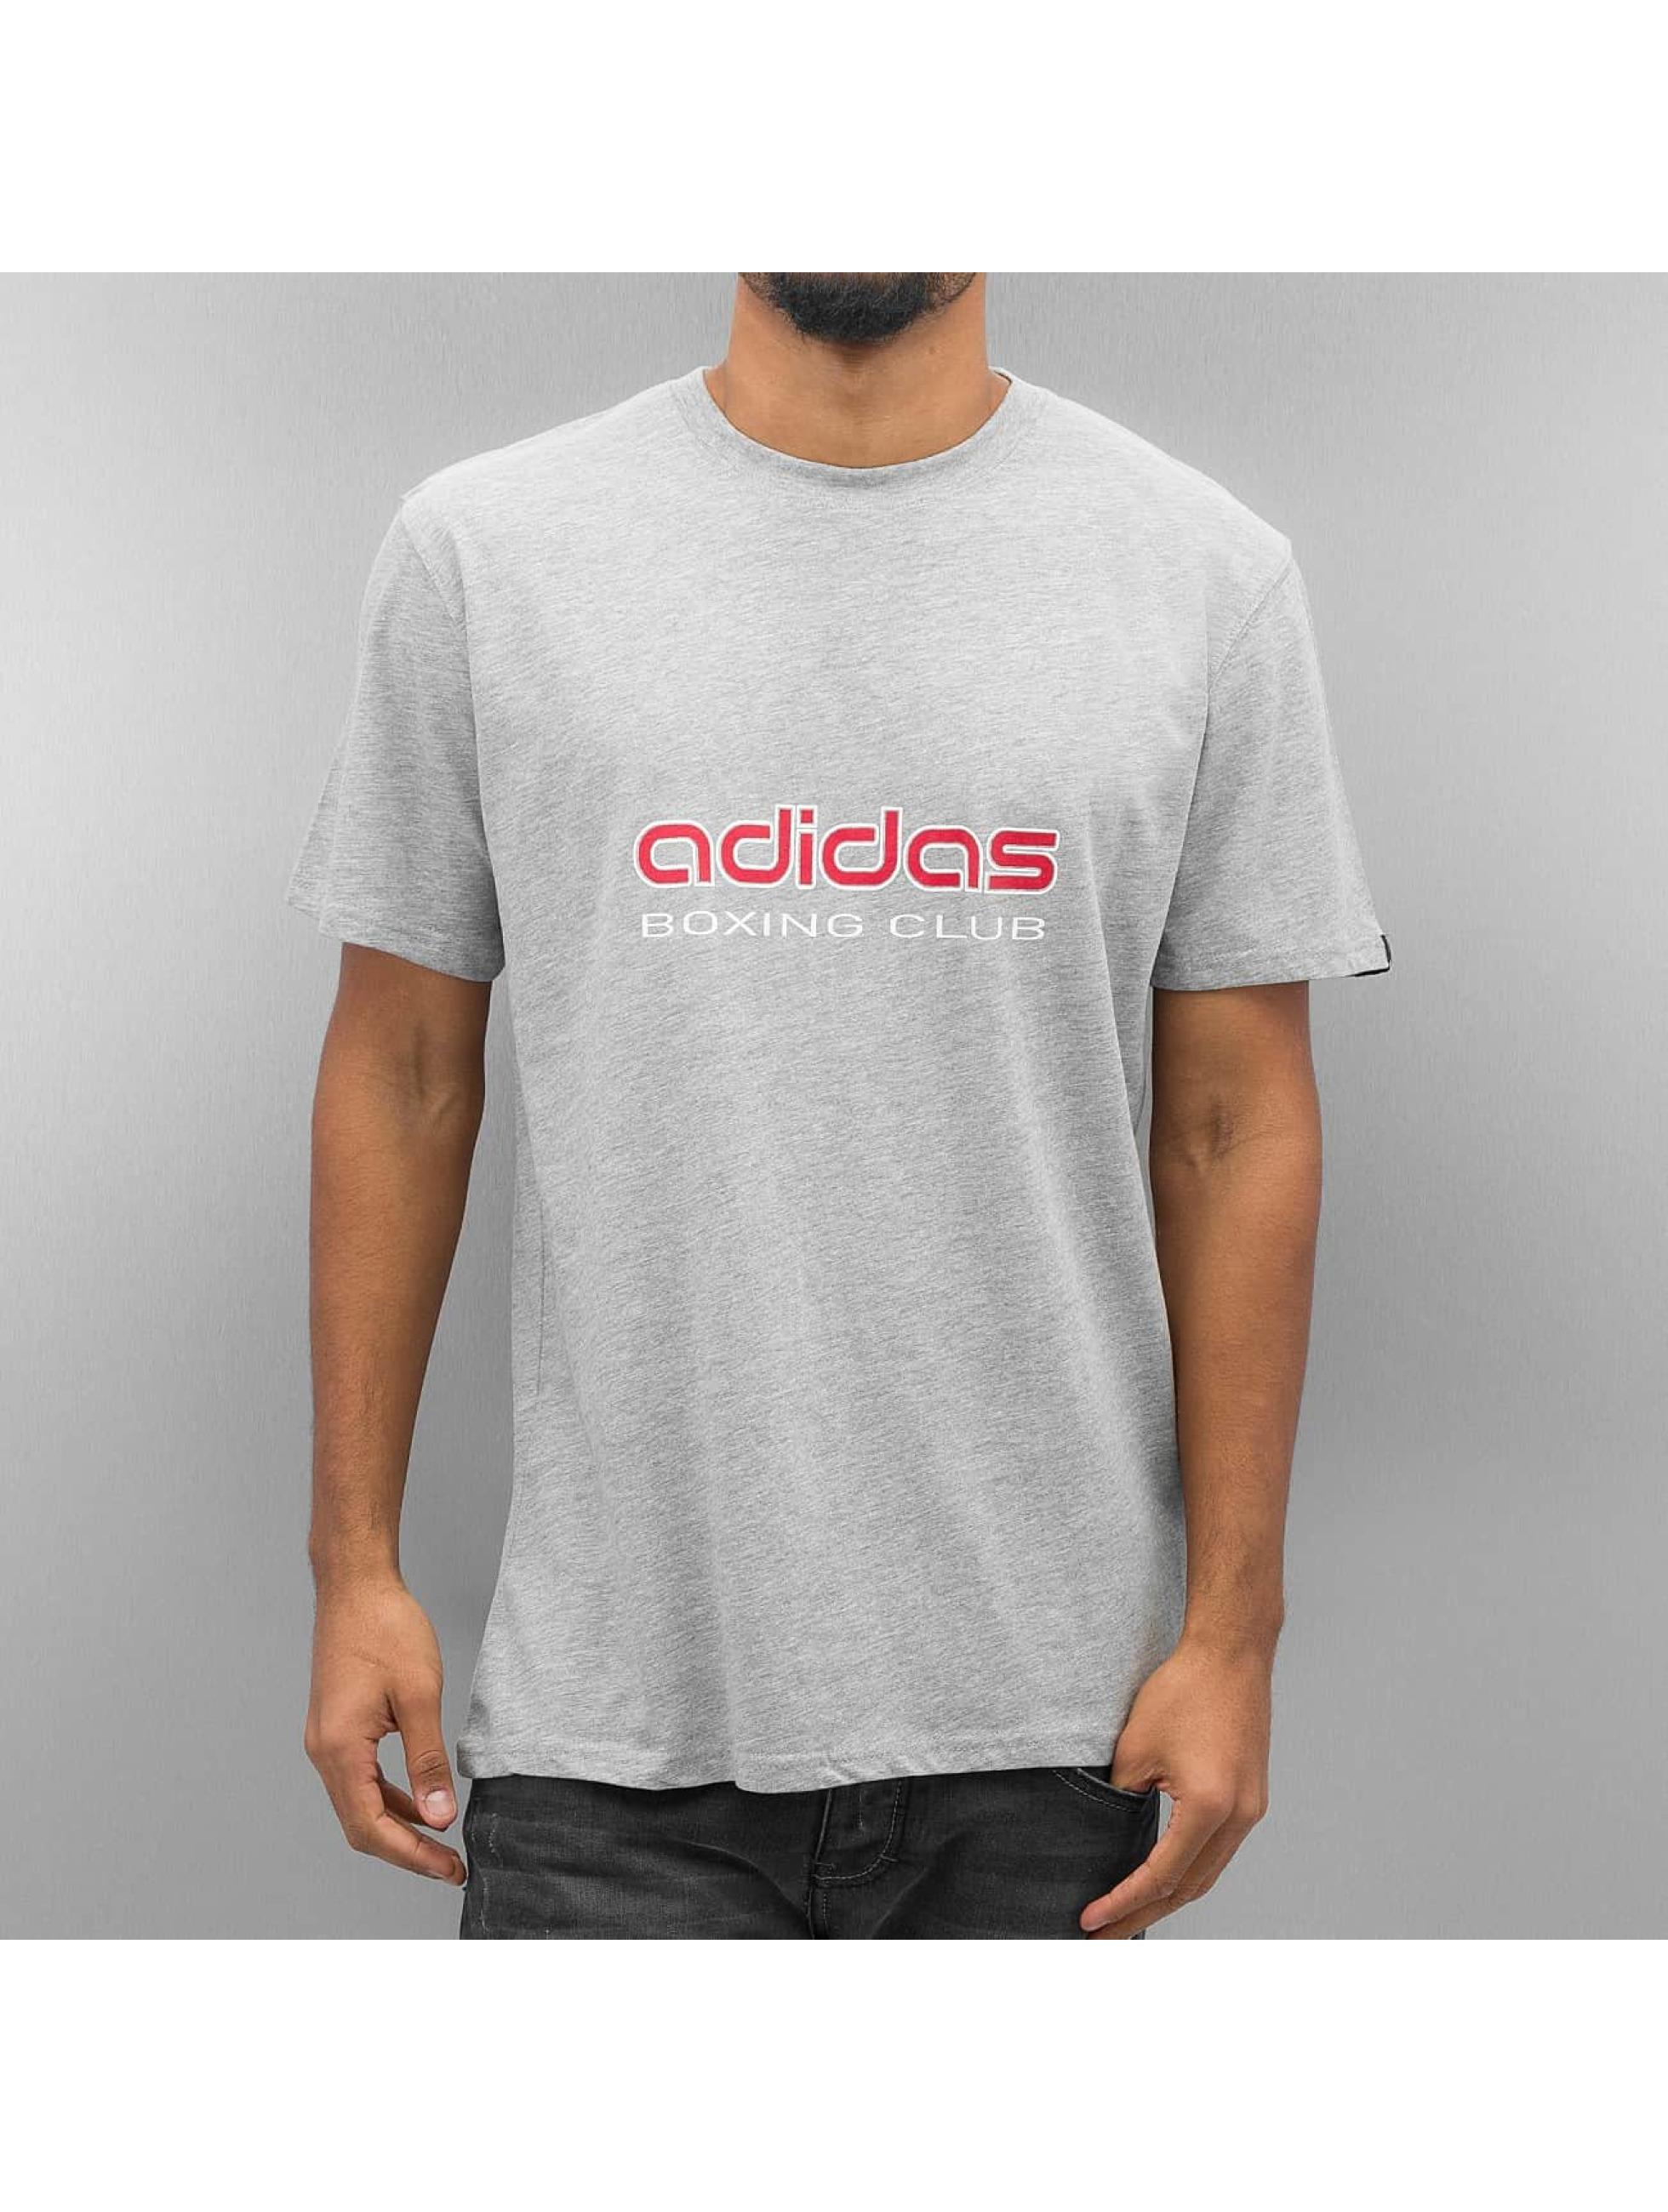 adidas Boxing MMA T-Shirt Boxing Club grey